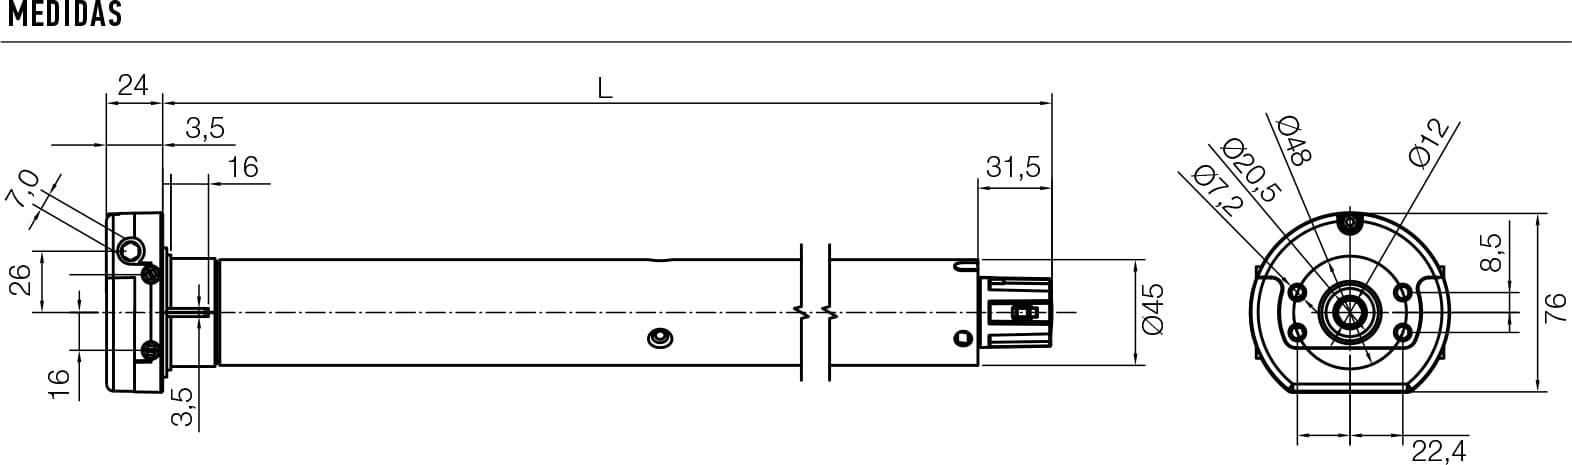 Era MH 5012